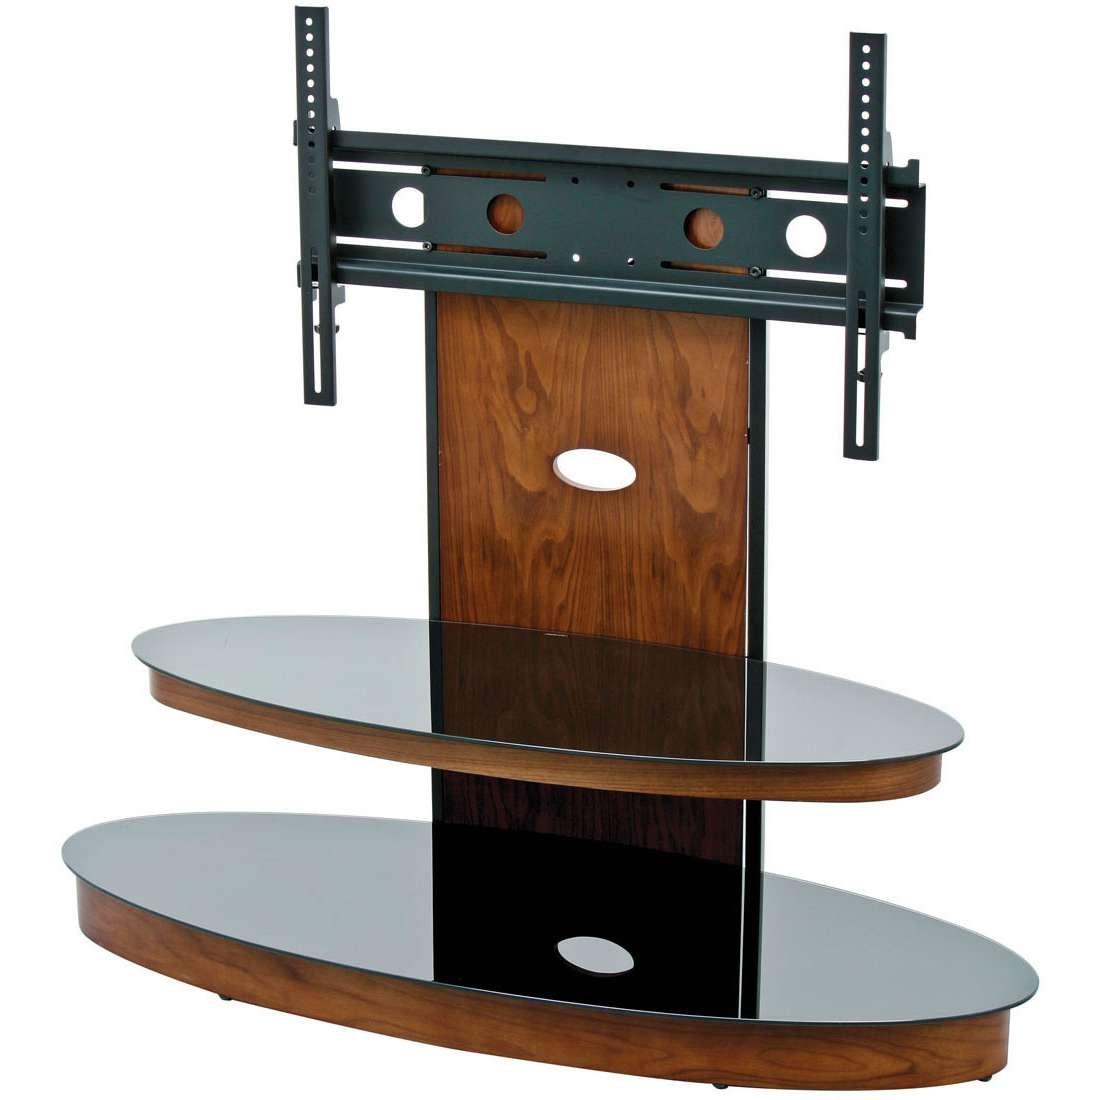 Tv : Origin S3 Oak Beautiful Tv Stands Cantilever Origin Ii S3 Oak Pertaining To Cheap Cantilever Tv Stands (View 2 of 15)